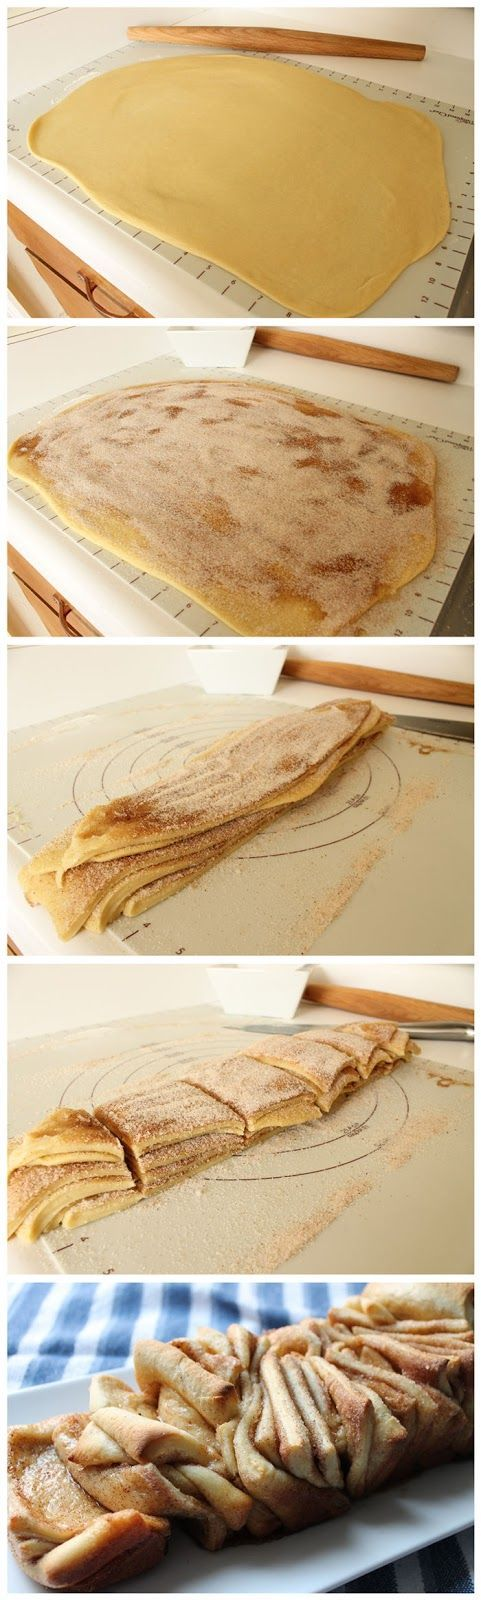 Cinnamon Sugar Pull-Apart Bread   Recipes   Pinterest